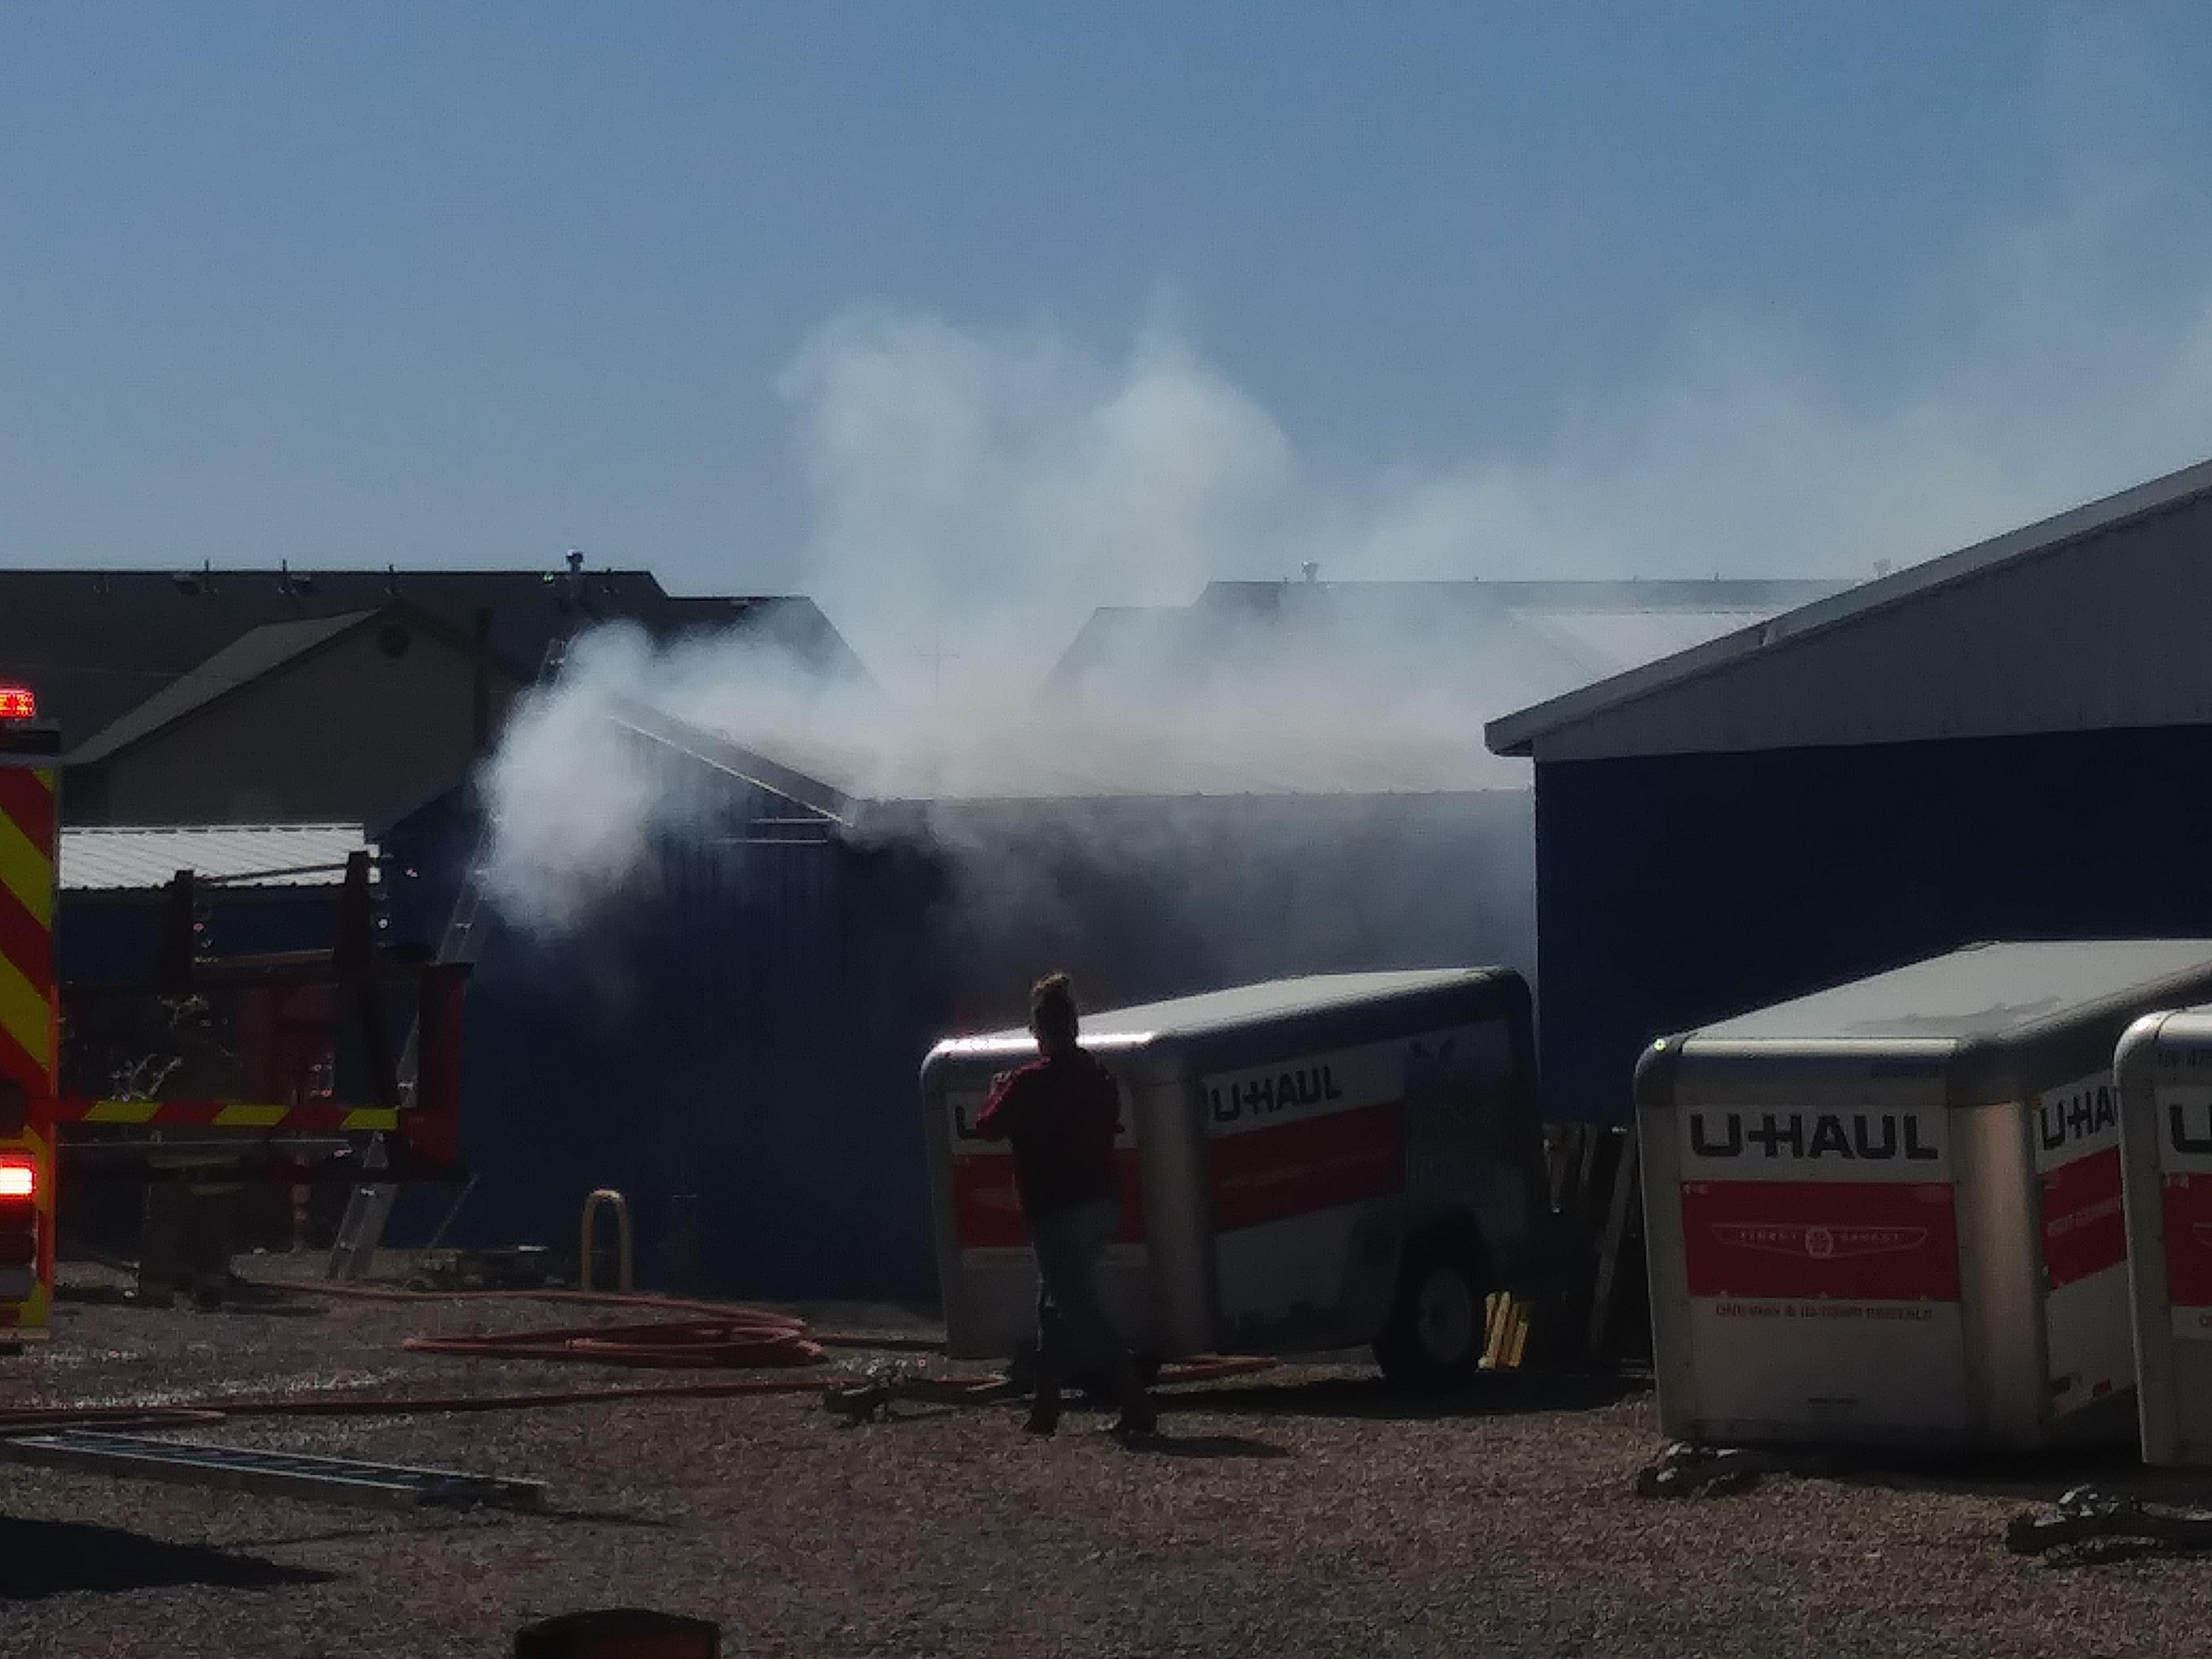 Attirant Smoke Billows From A Fire In A Storage Unit In Cedar City, Utah, June 4,  2018 | Photo Courtesy Of Carin Miller, Cedar City News/St. George News